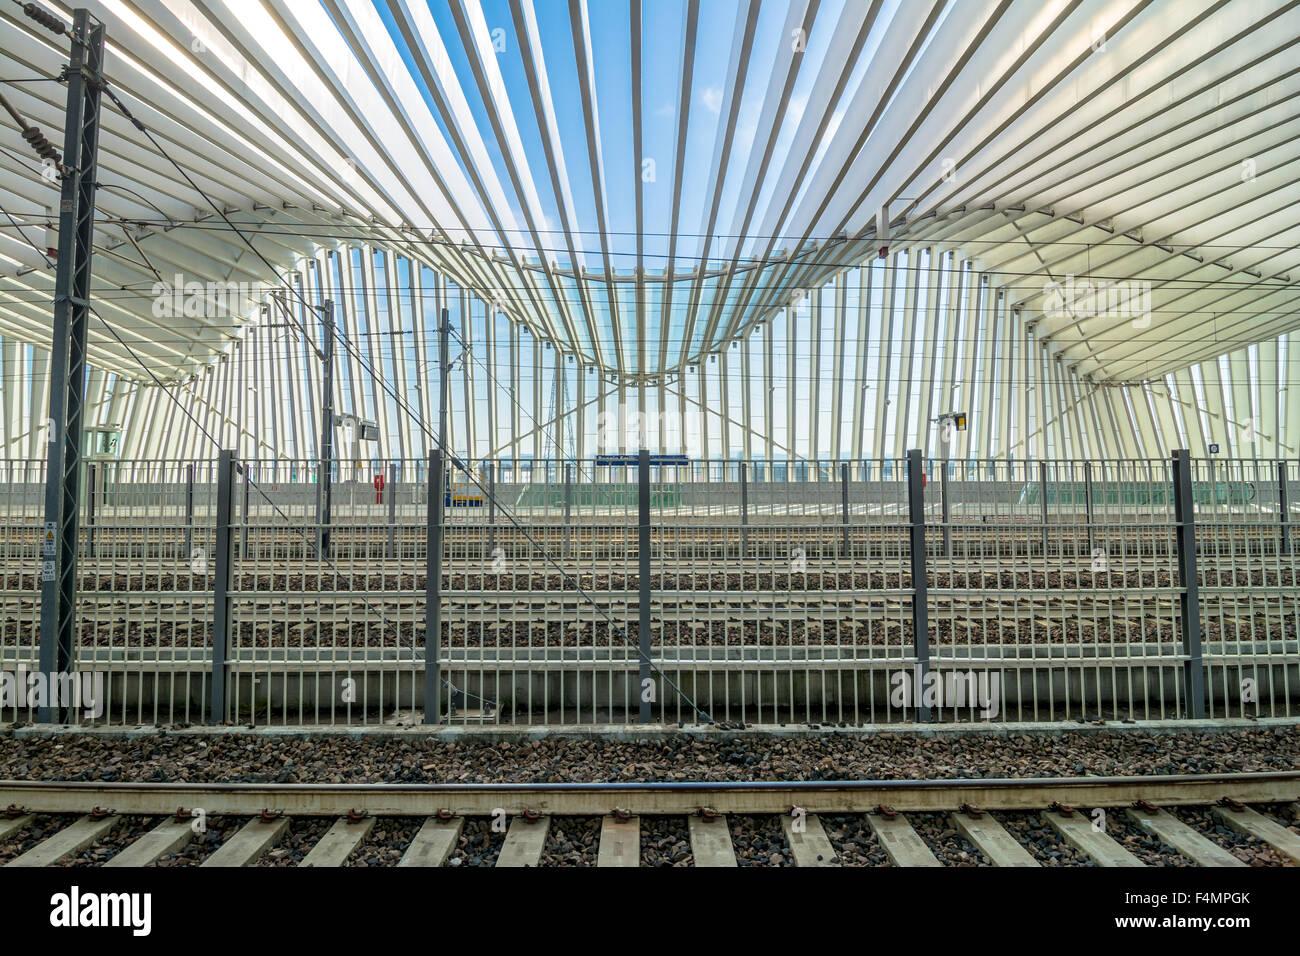 Mediopadana High Speed Train Station in Reggio Emilia, Italy. - Stock Image